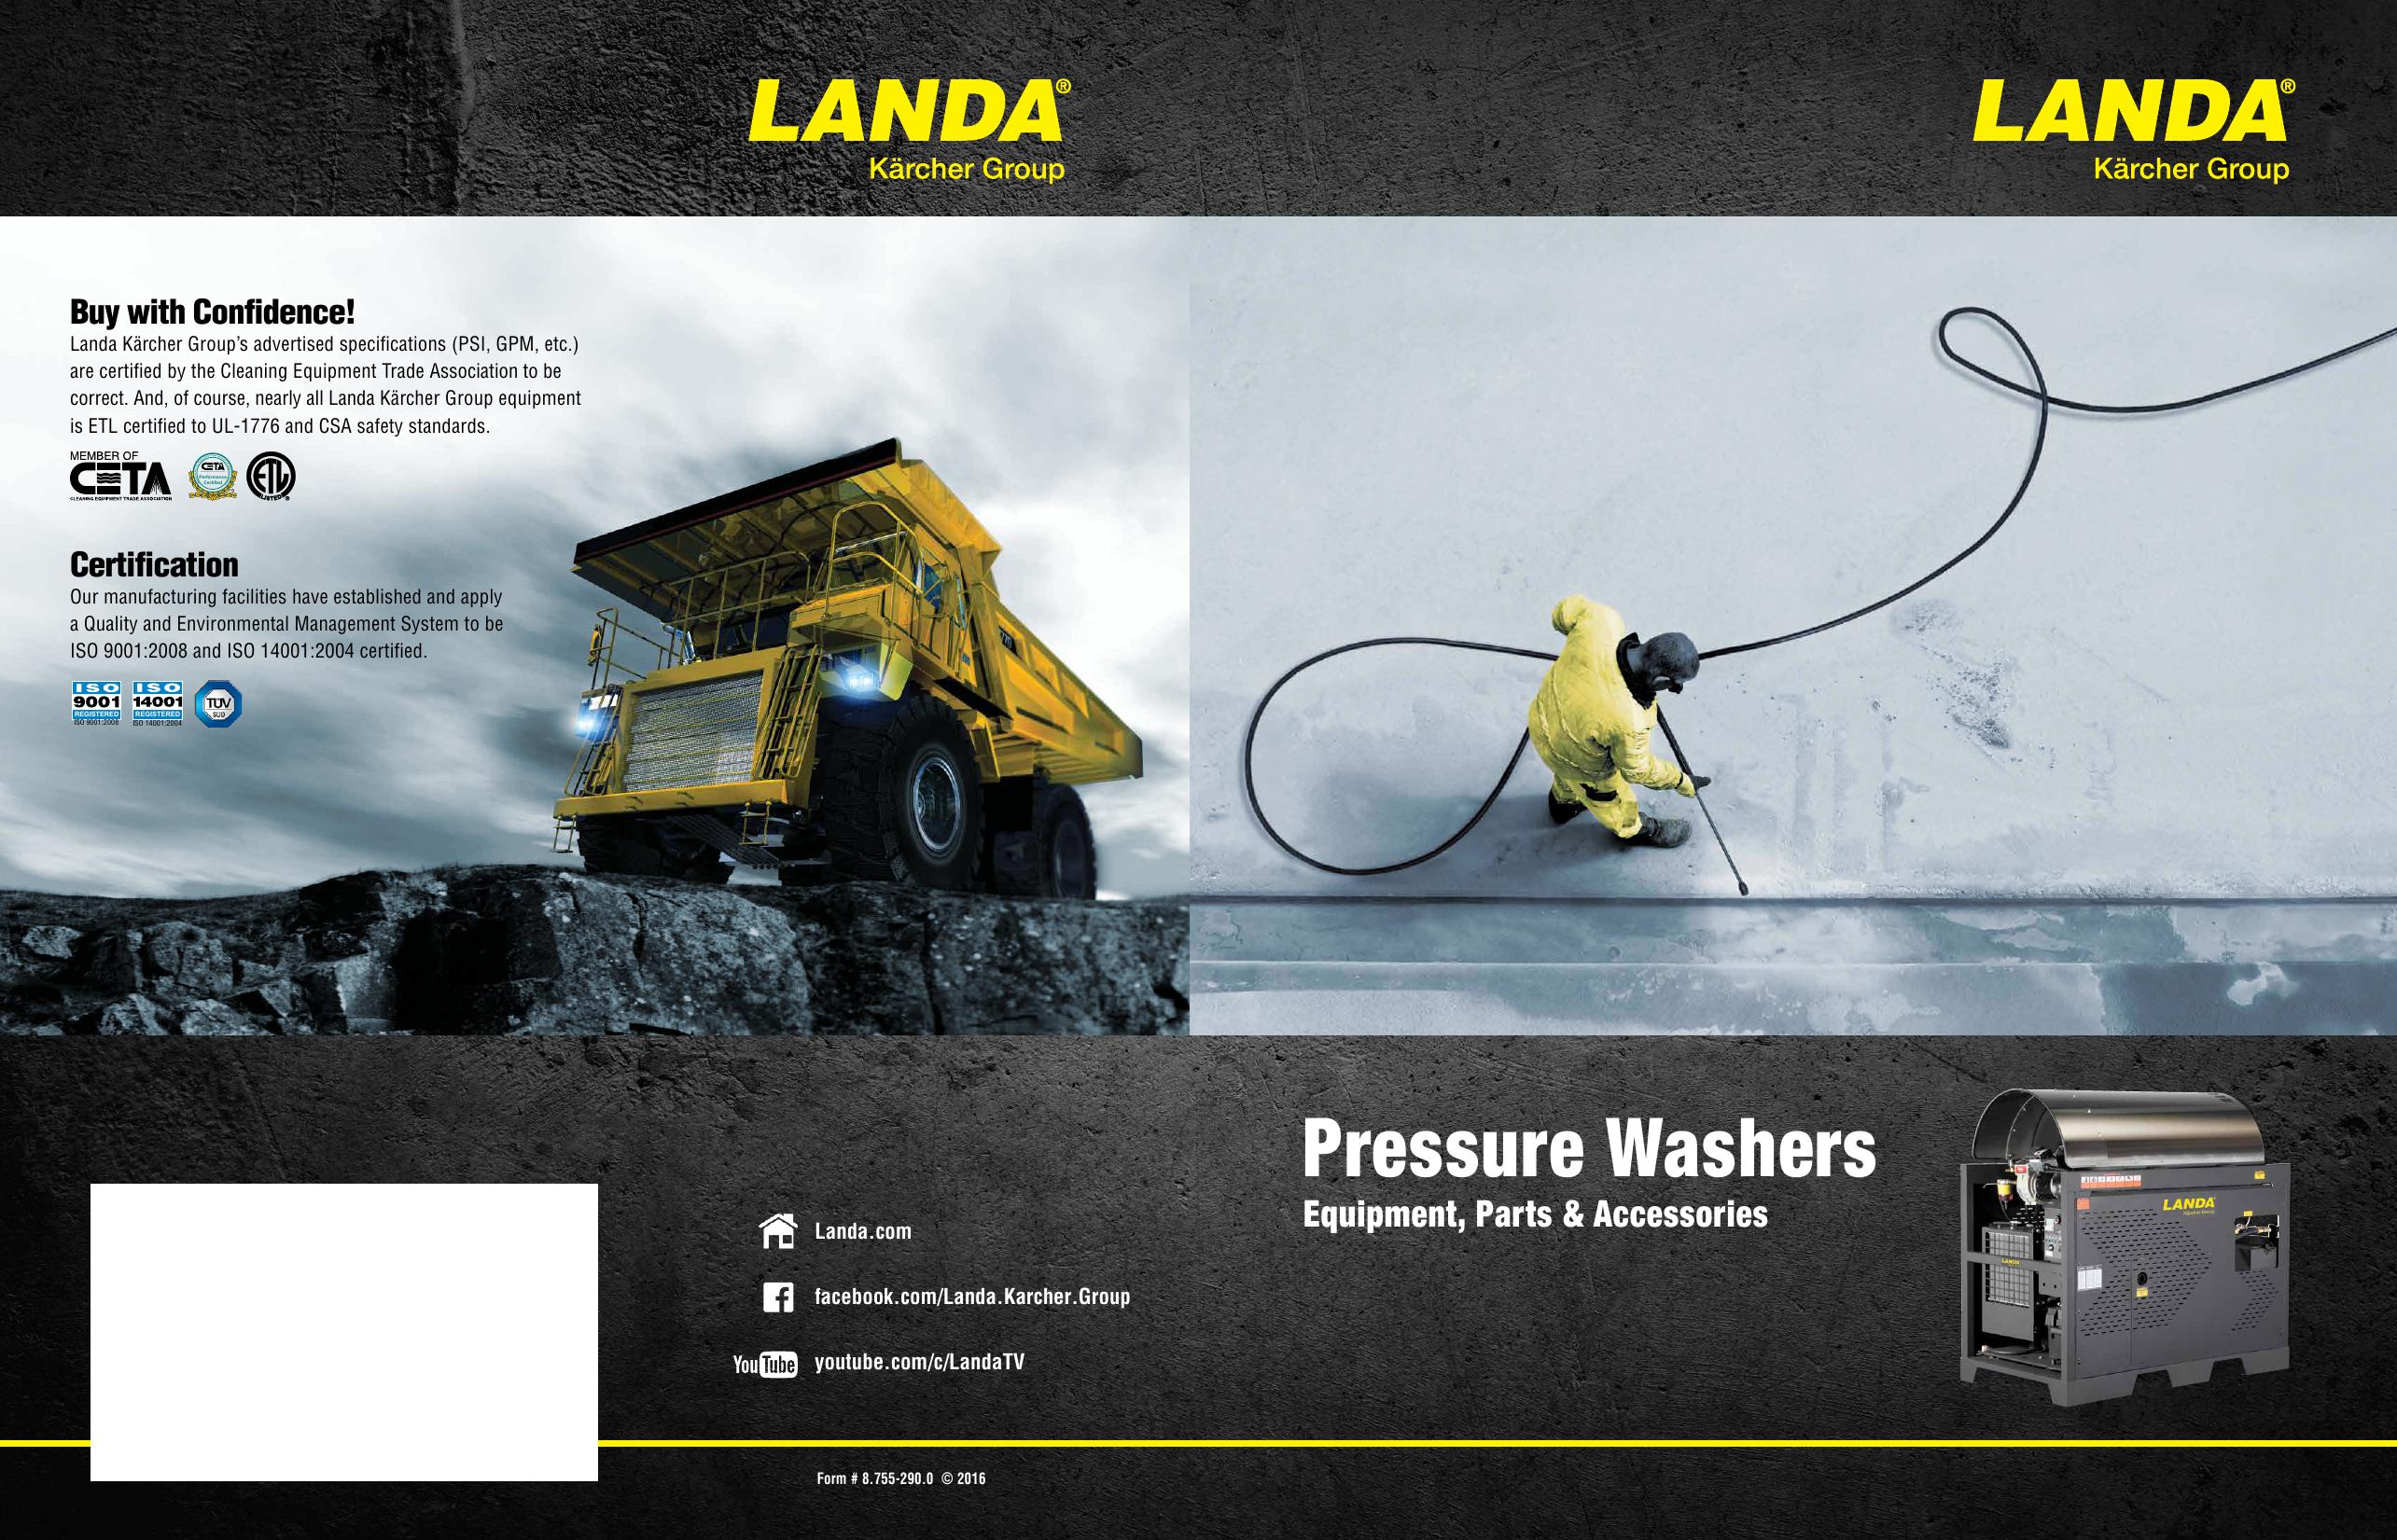 Landa Karcher Group Catalog 2016 | manualzz.com on